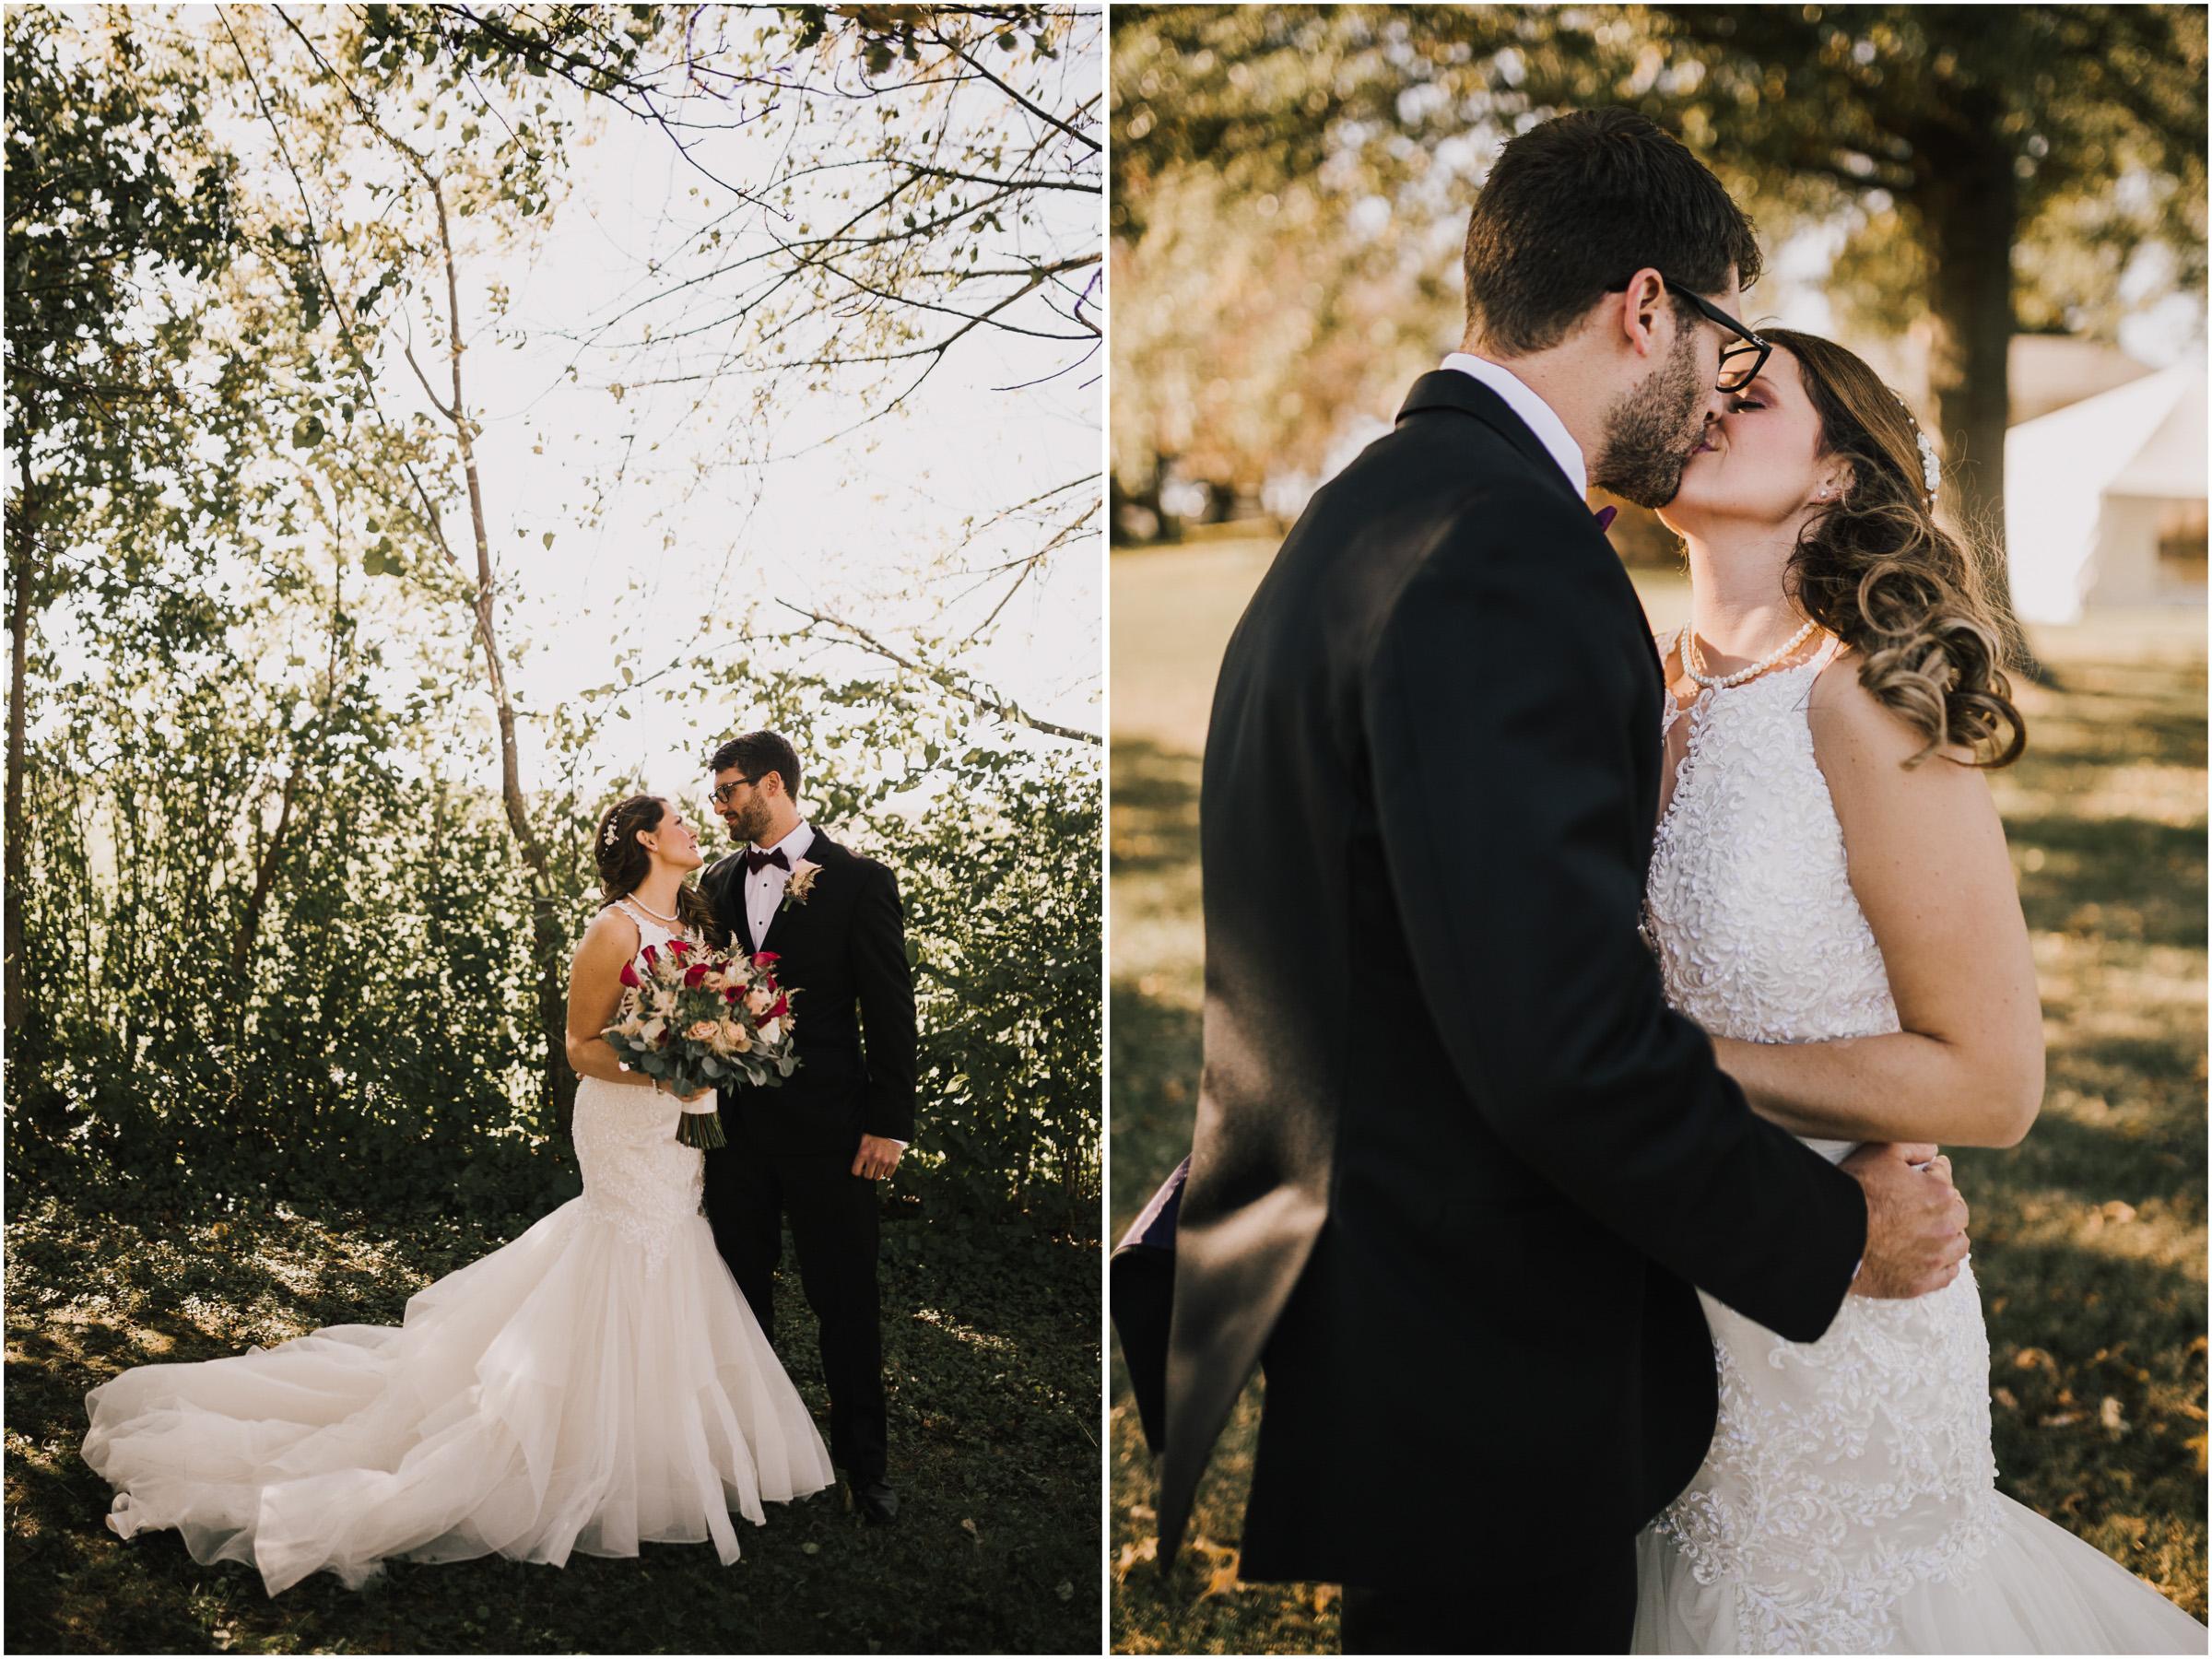 alyssa barletter photography intimate fall autumn wedding rural missouri wedding photographer-21.jpg